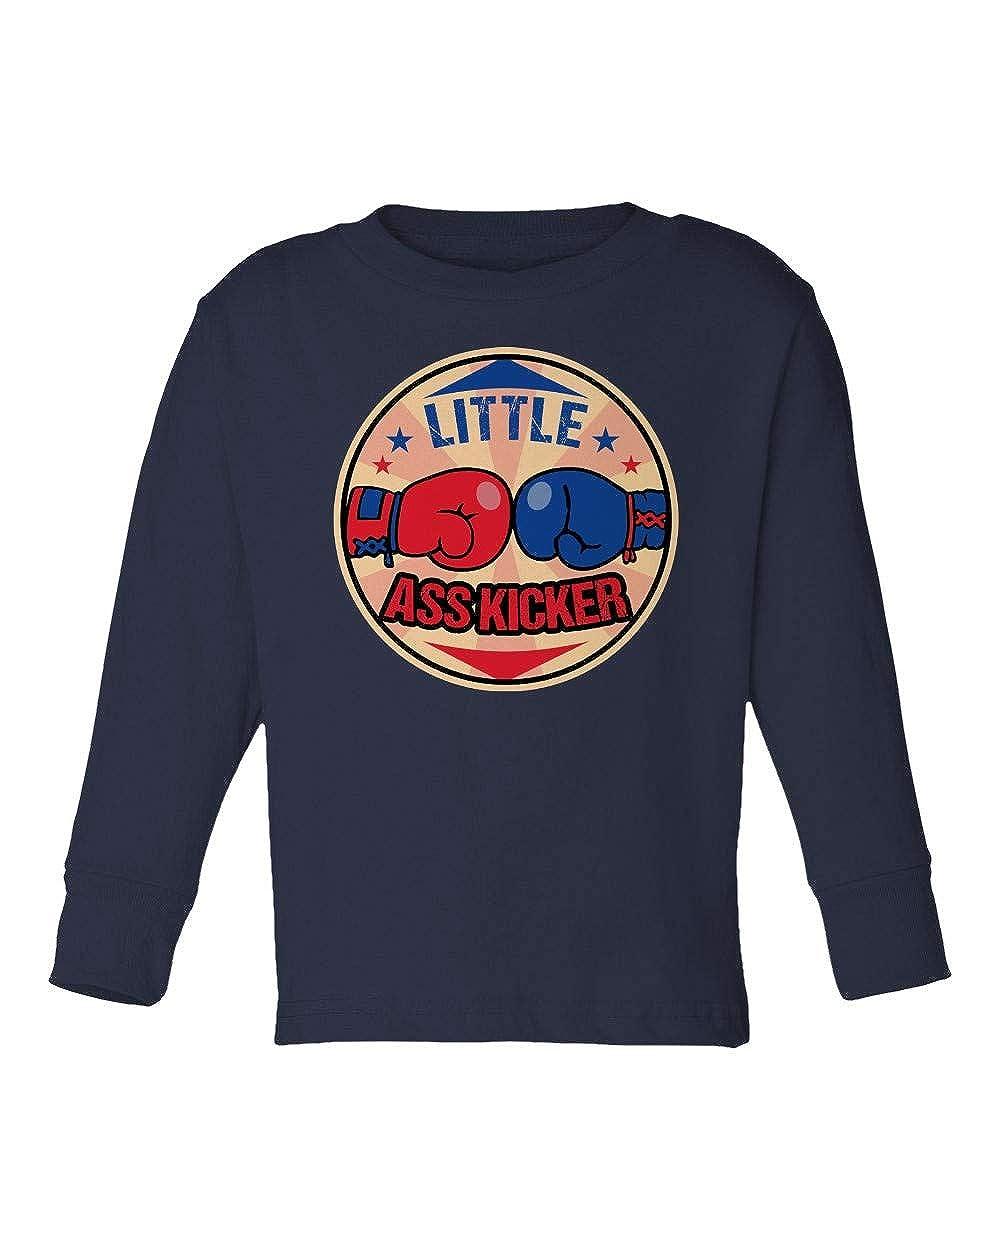 Societee Little Ass Kicker Boxing Walking Dead Funny Girls Boys Toddler Long Sleeve T-Shirt